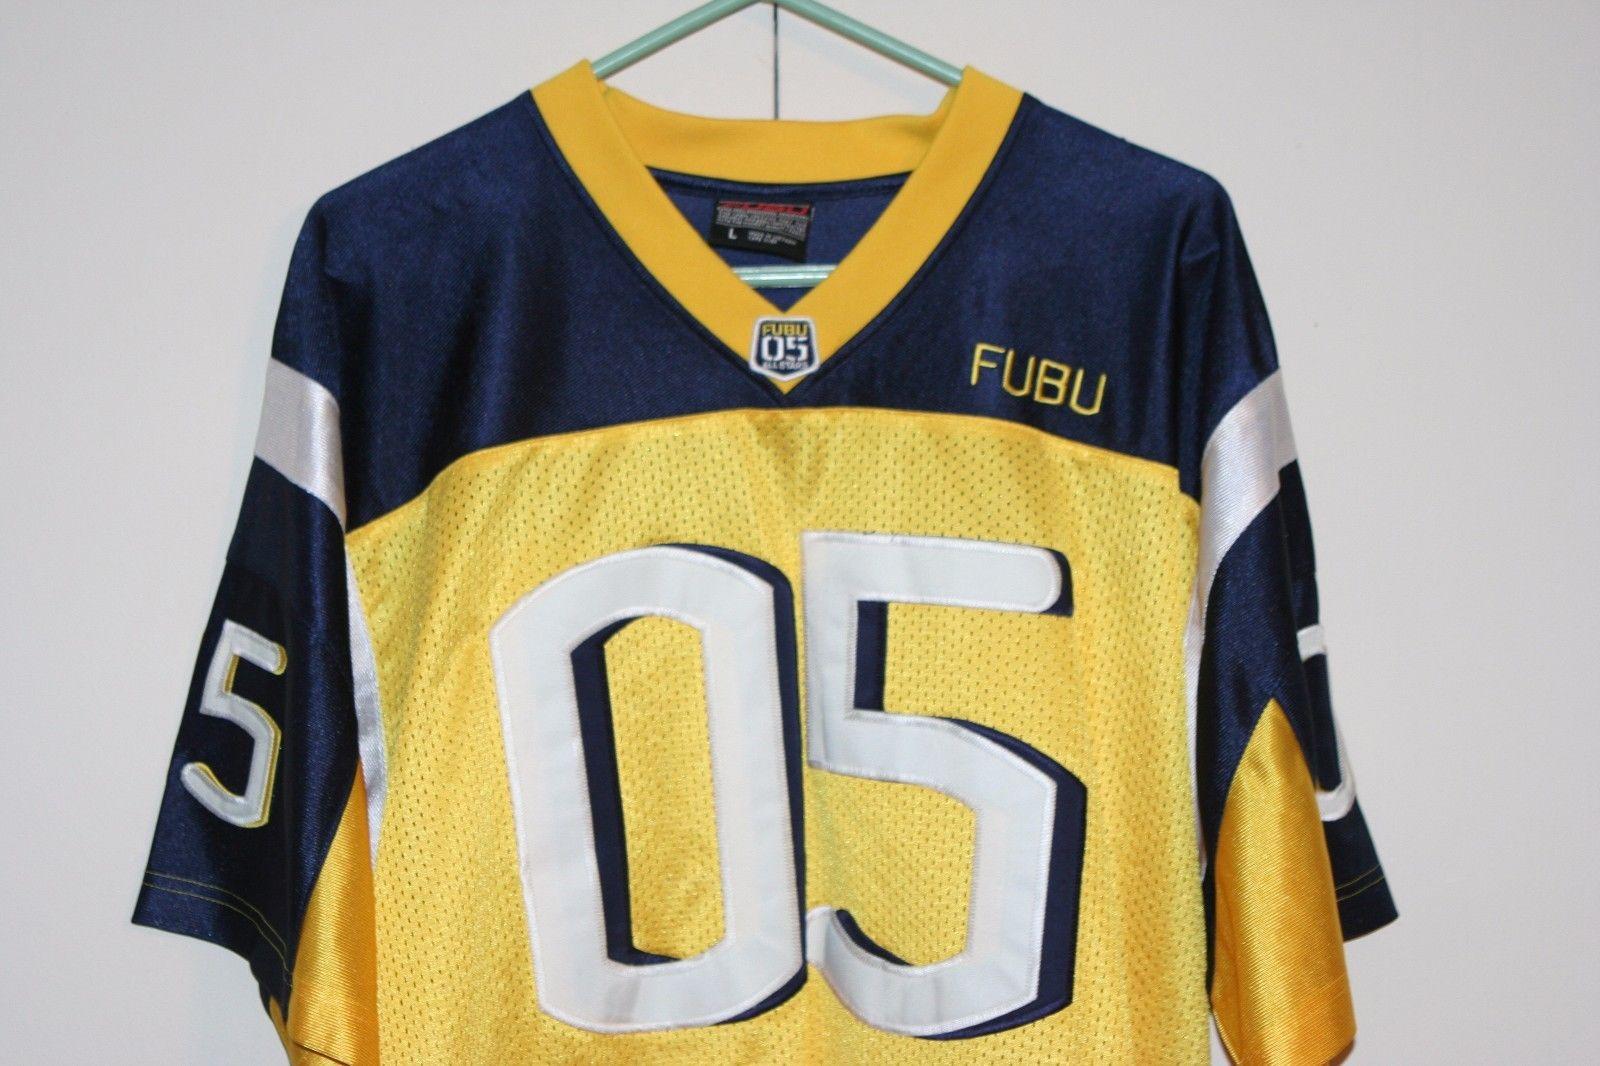 fubu-sports-05-vtg-football-jersey-multi-yellow-blue-athletic-hip-hop-men-large-630cea36fd87b40838b3e7b94a7f1023.jpg